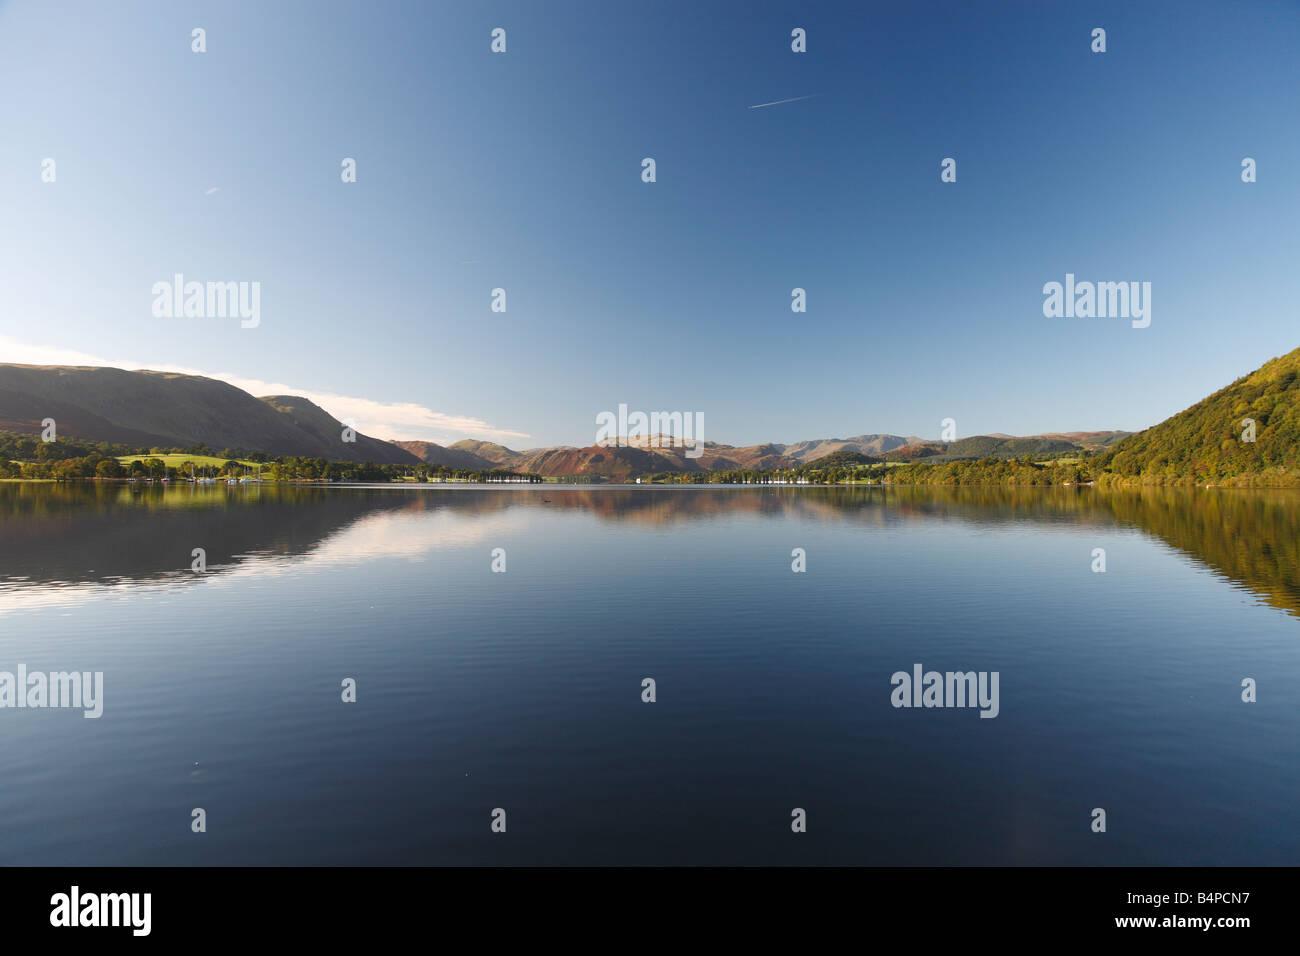 Lake scene with jetty, trees and hills. Pooley Bridge, The Lake District Cumbria, England, United Kingdom. - Stock Image